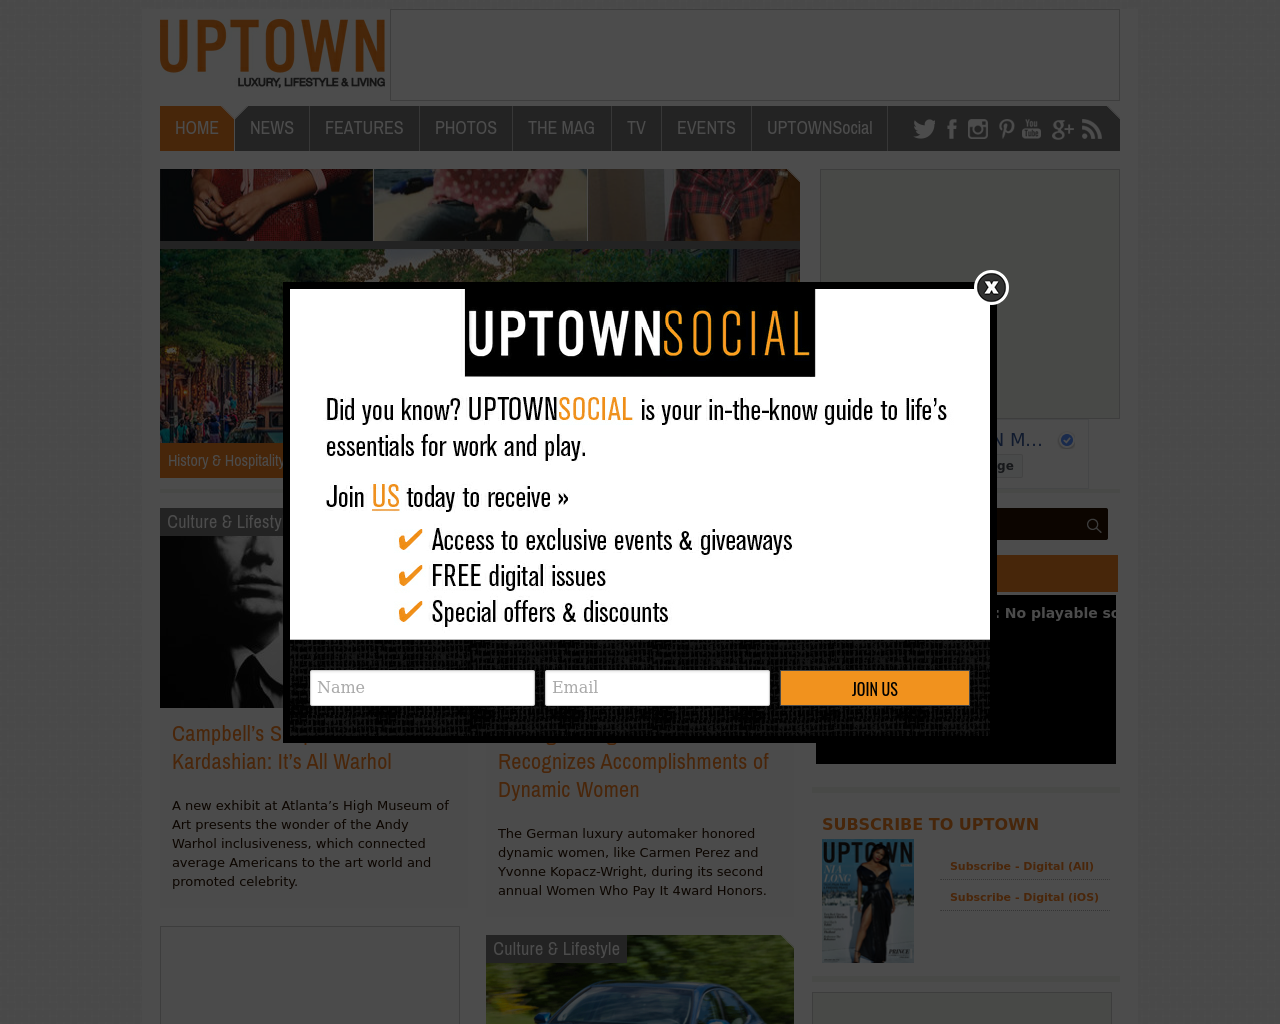 UPTOWN-Advertising-Reviews-Pricing